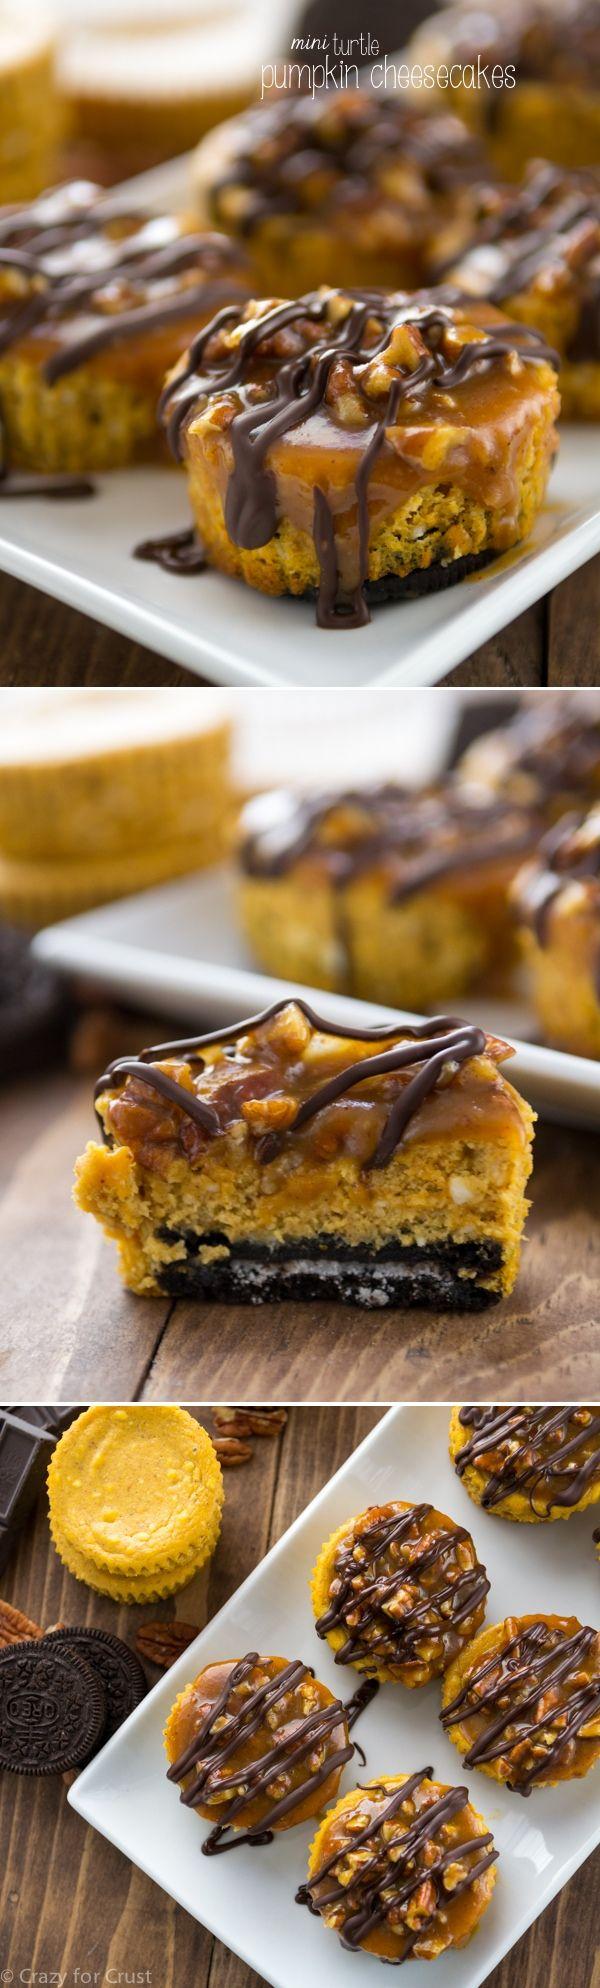 Mini Cheesecake Recipe, Food, Sweet Tooth, Turtle Pumpkin, Pumpkin ...